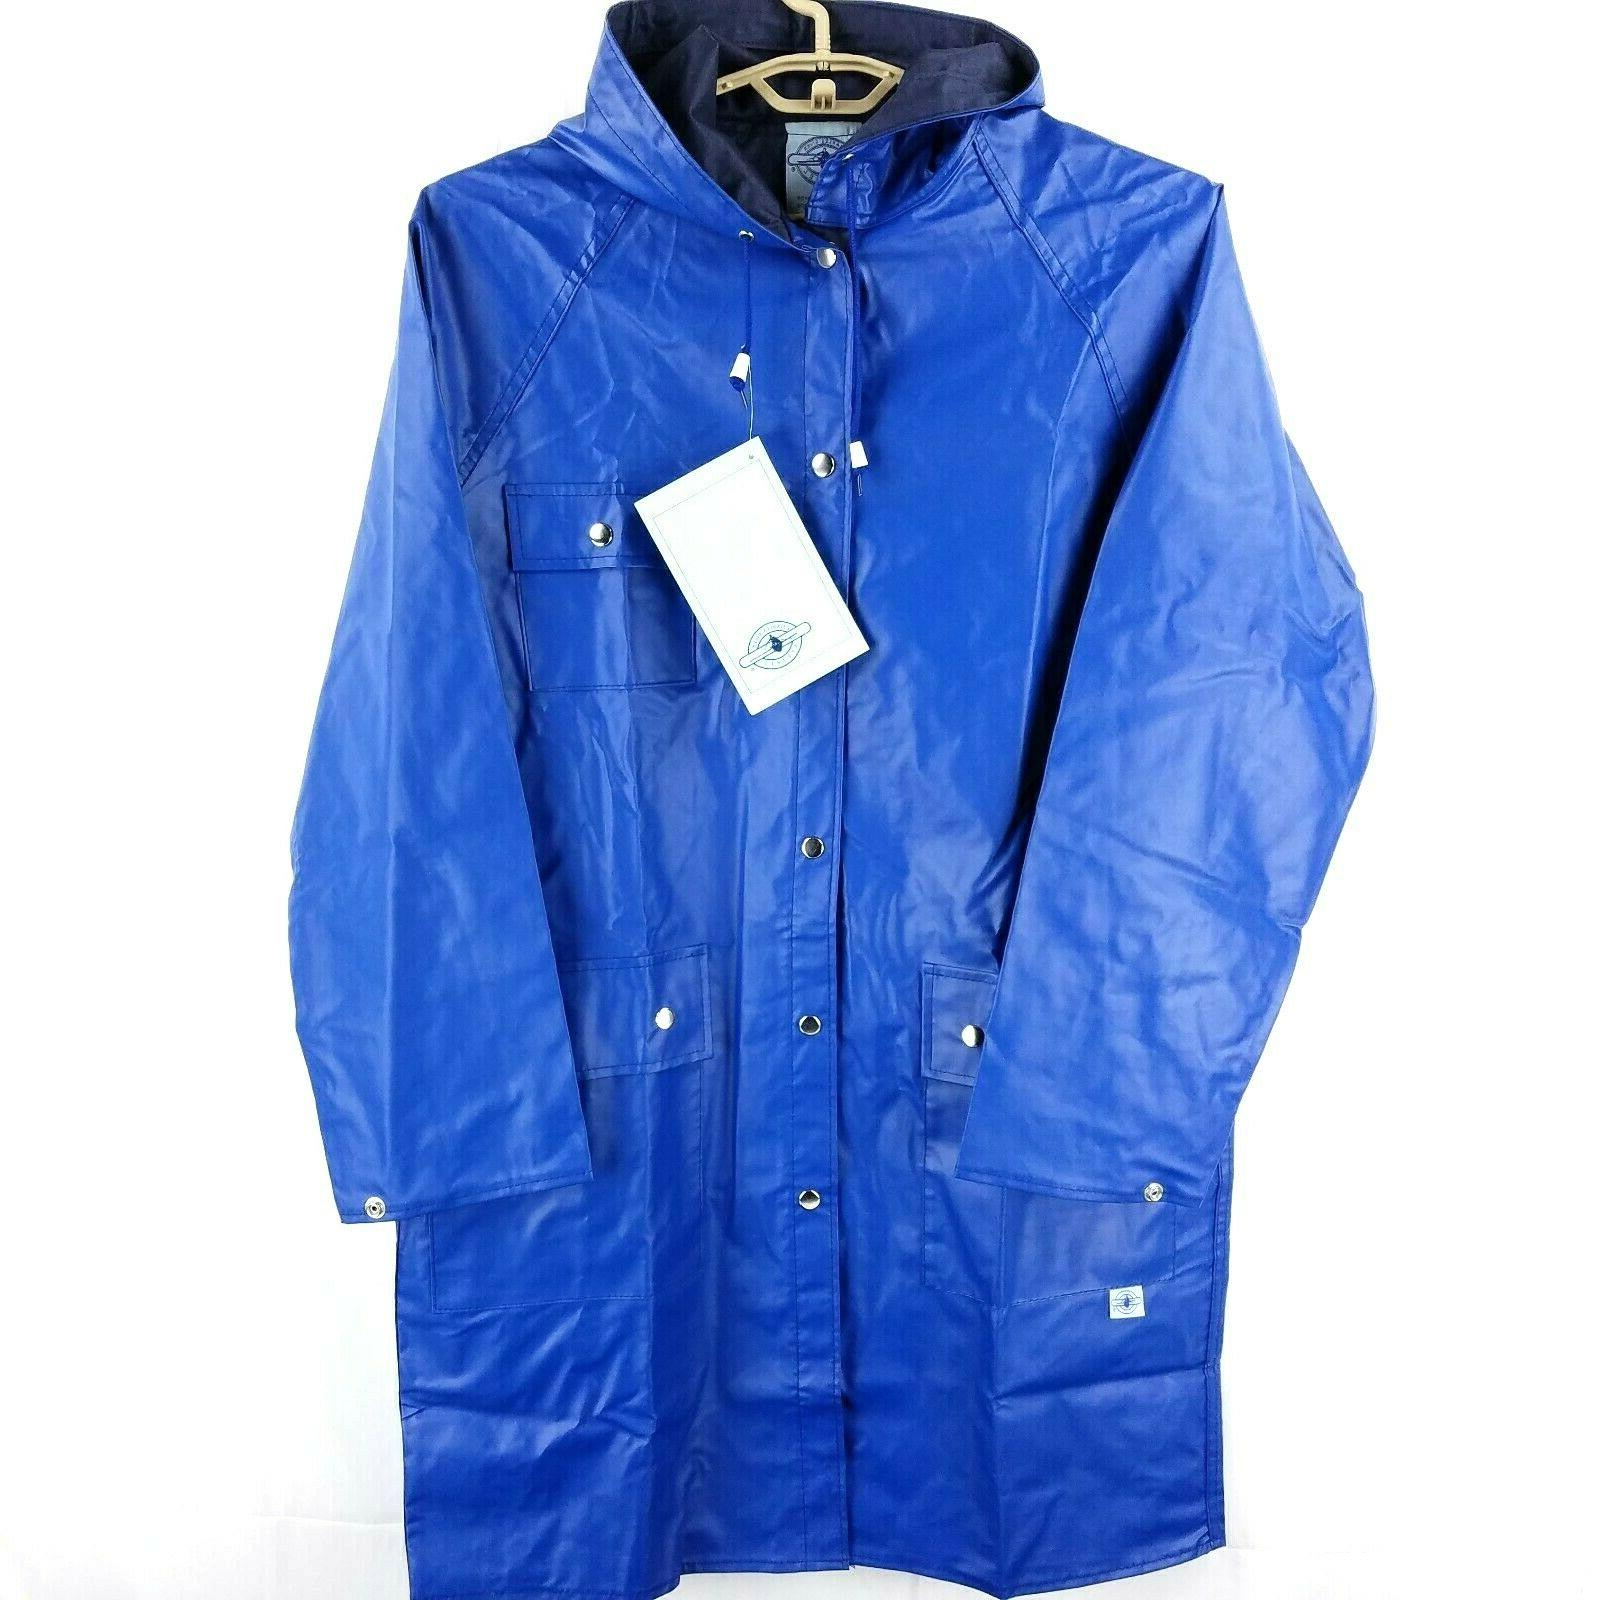 nwt blue waterproof rain coat knee length